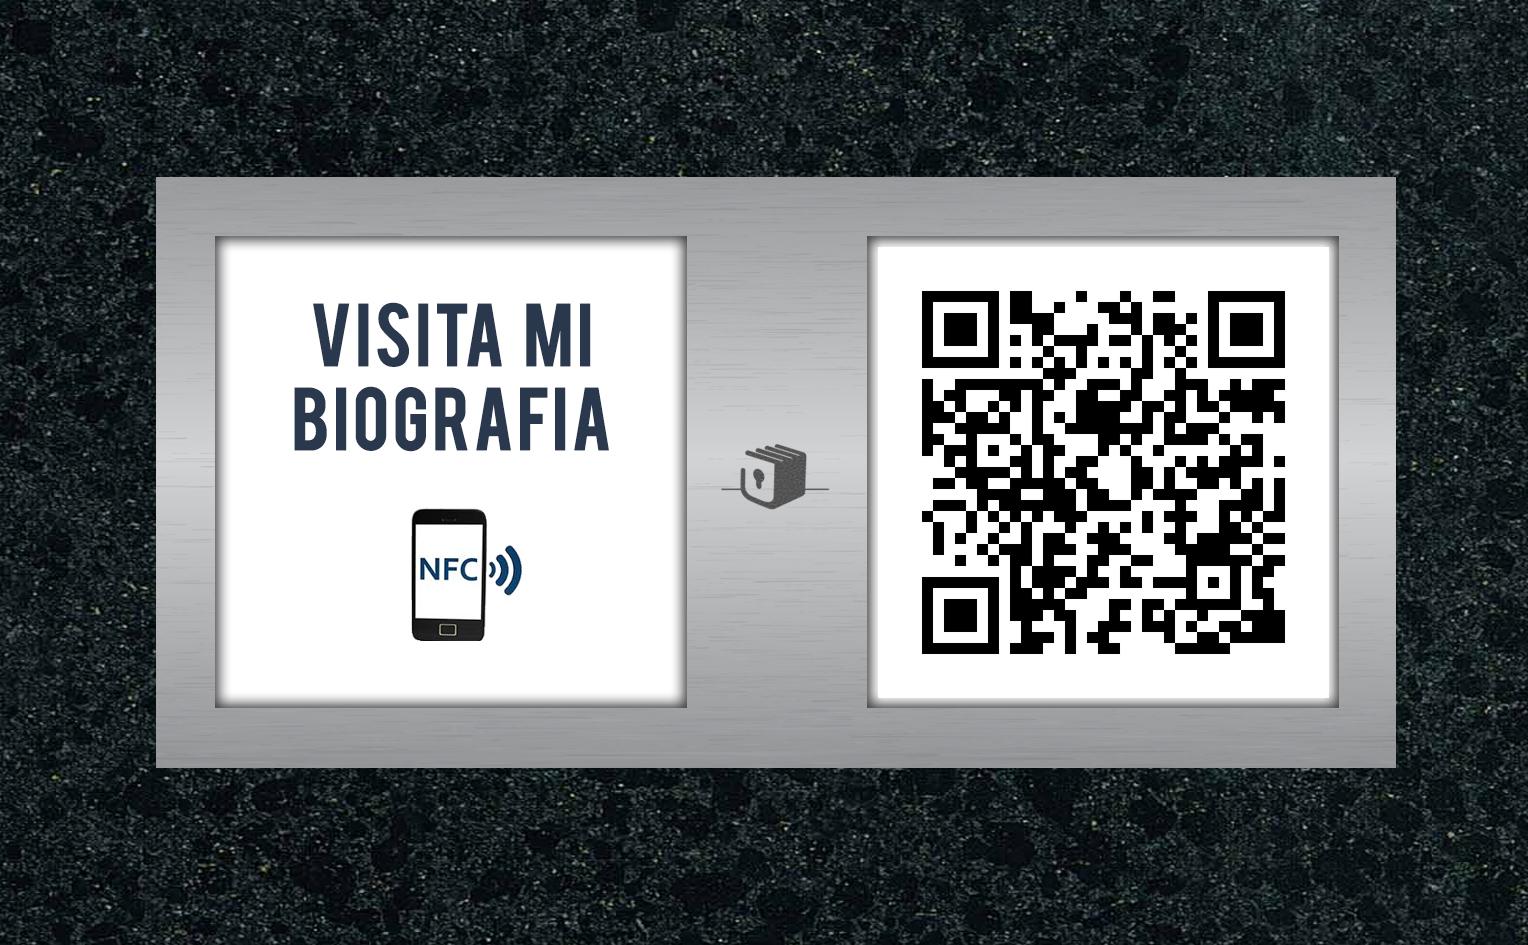 Códigos QR y NFC